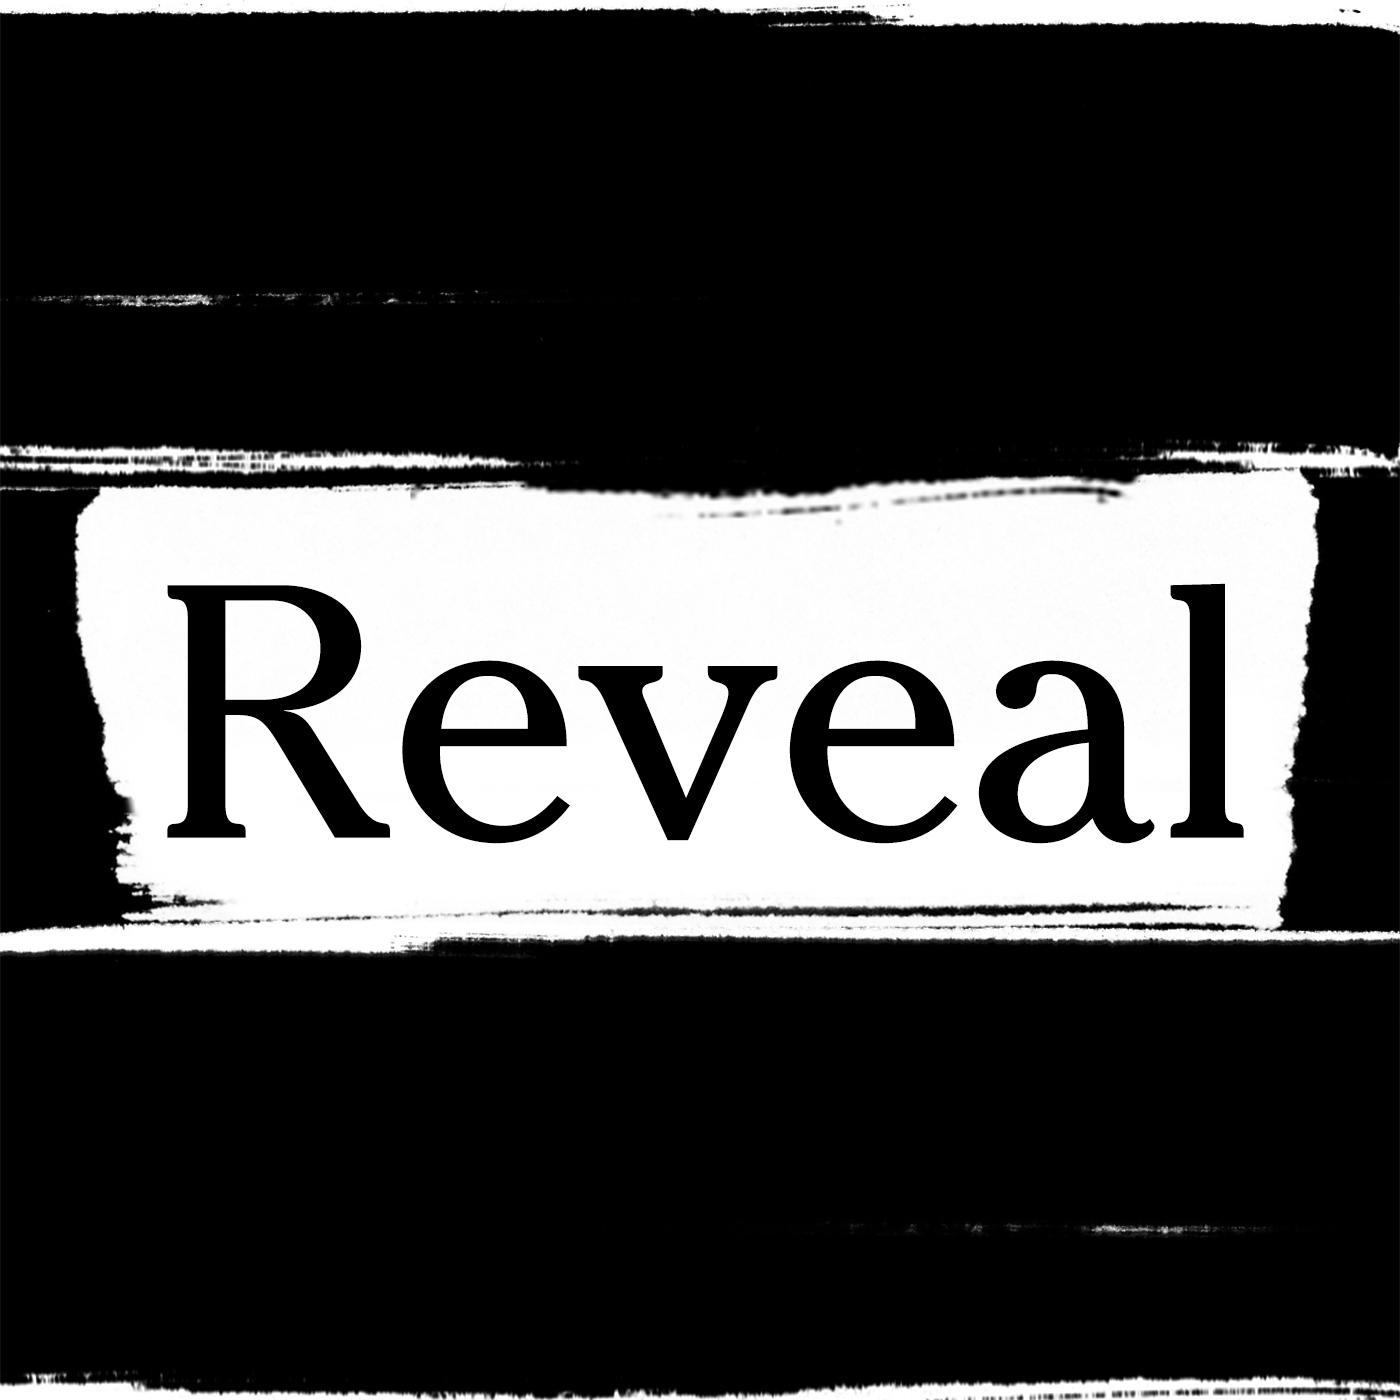 Reveal - In-depth investigative reporting. Listen